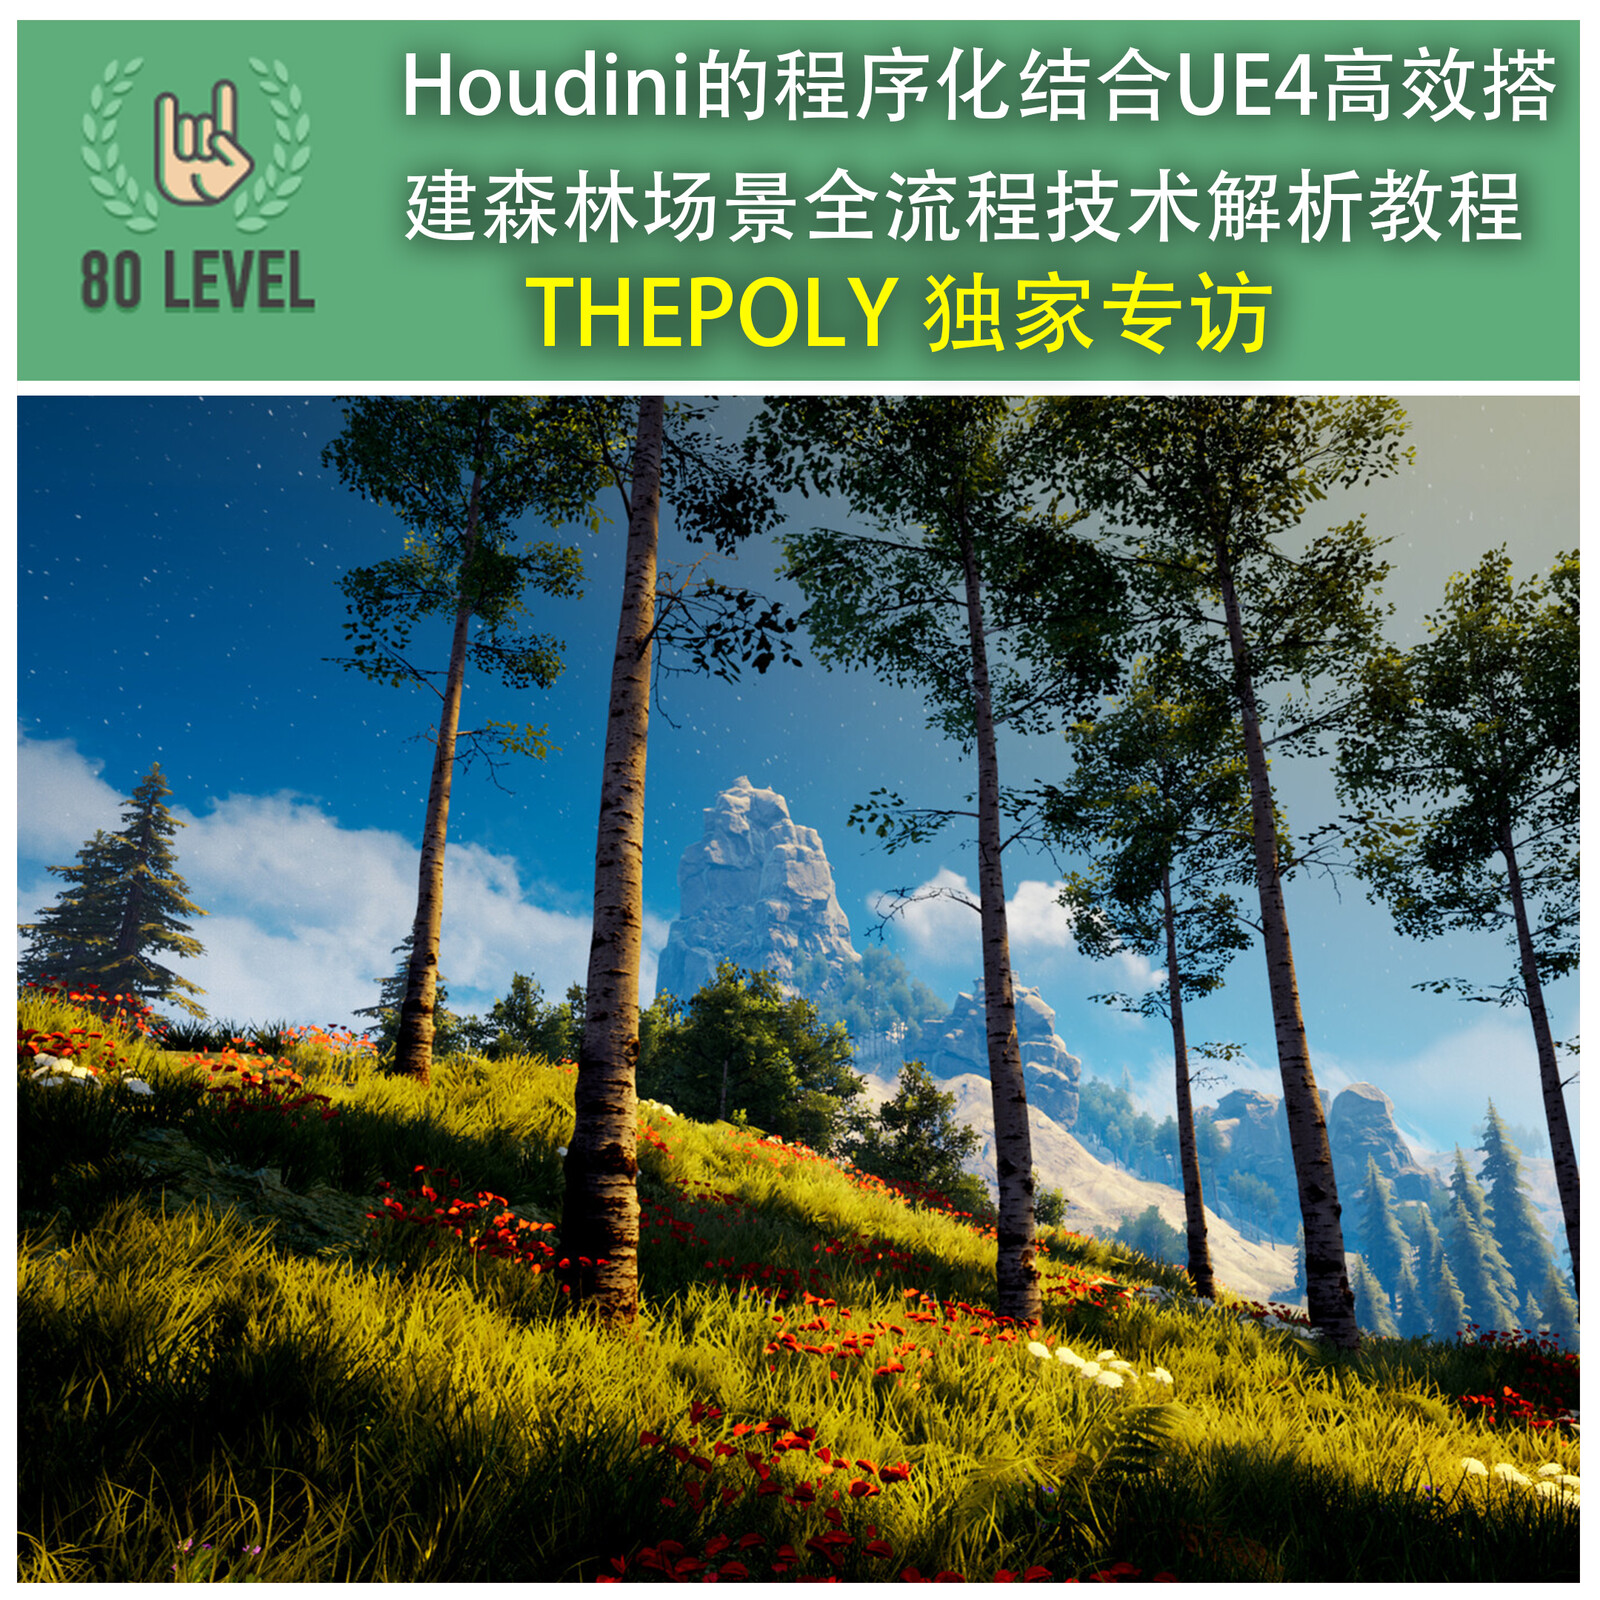 80.lv Houdini和虚幻4引擎个人独家专访 - 高效搭建森林场景(Procedural Forest Terrain)全流程中文技术解析教程